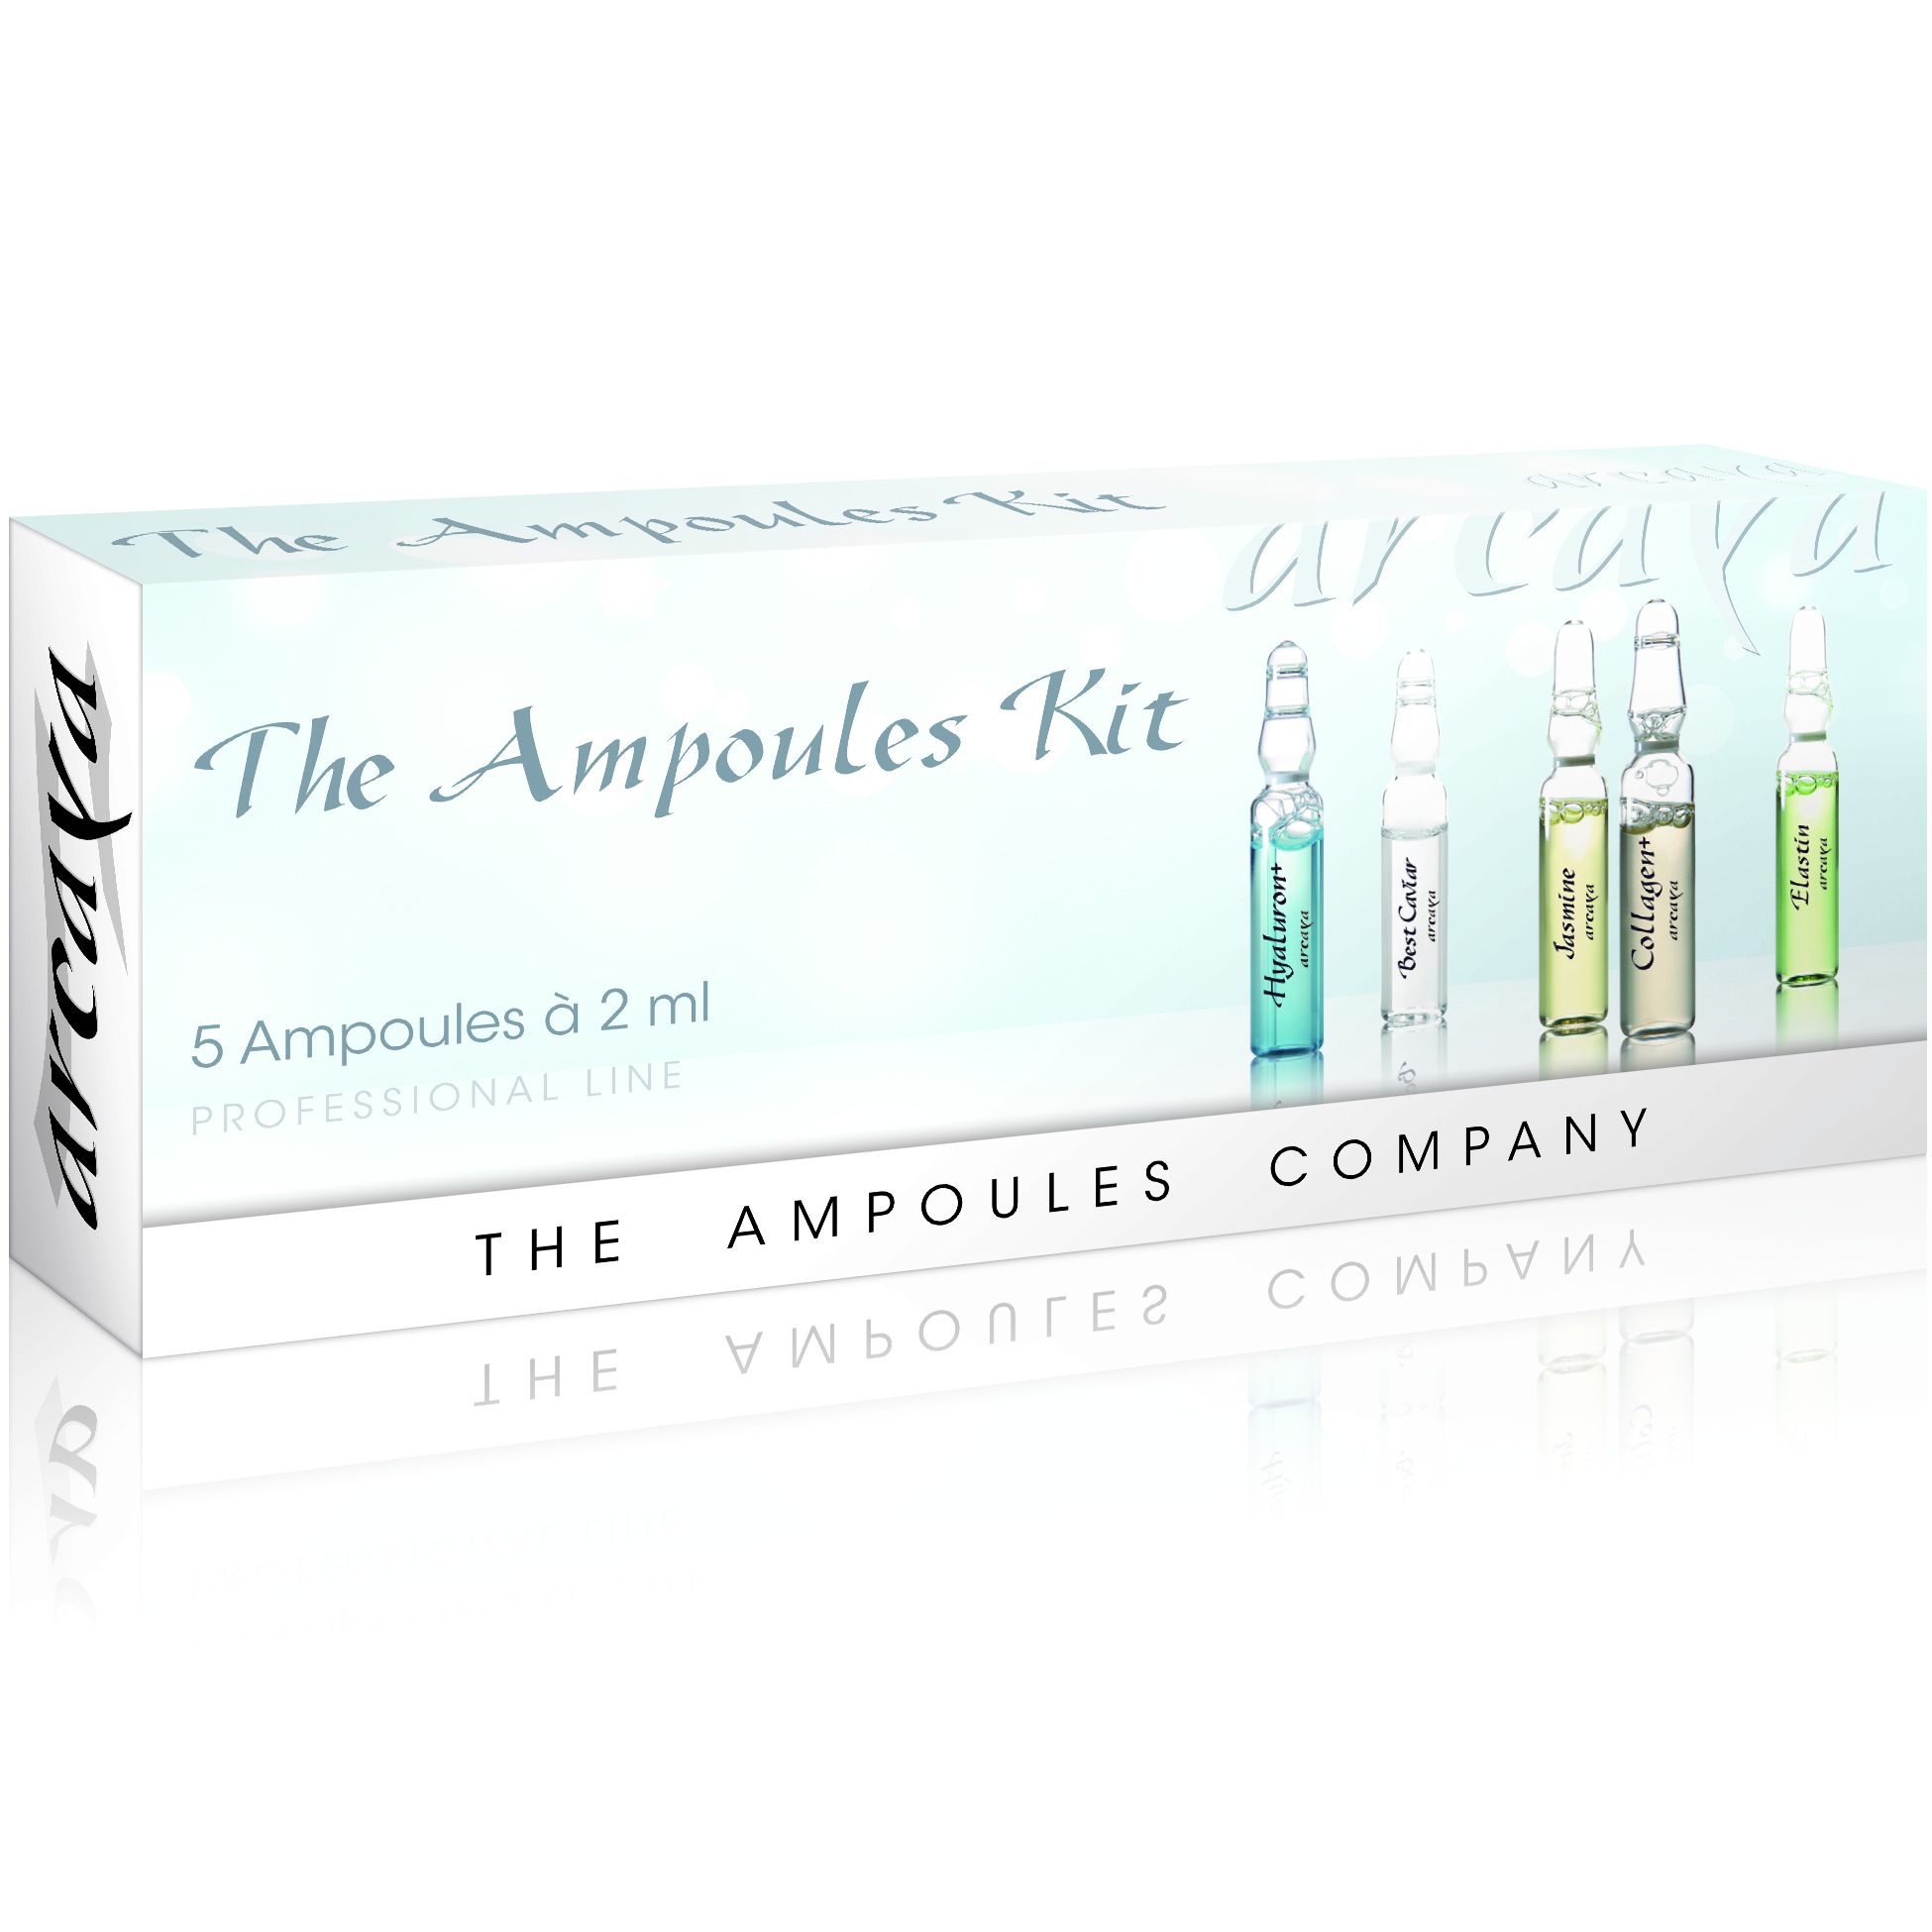 Arcaya The Ampoules Kit Πακέτο Περιποίησης Εντατικής Φροντίδας 5 αμπούλεςx2ml